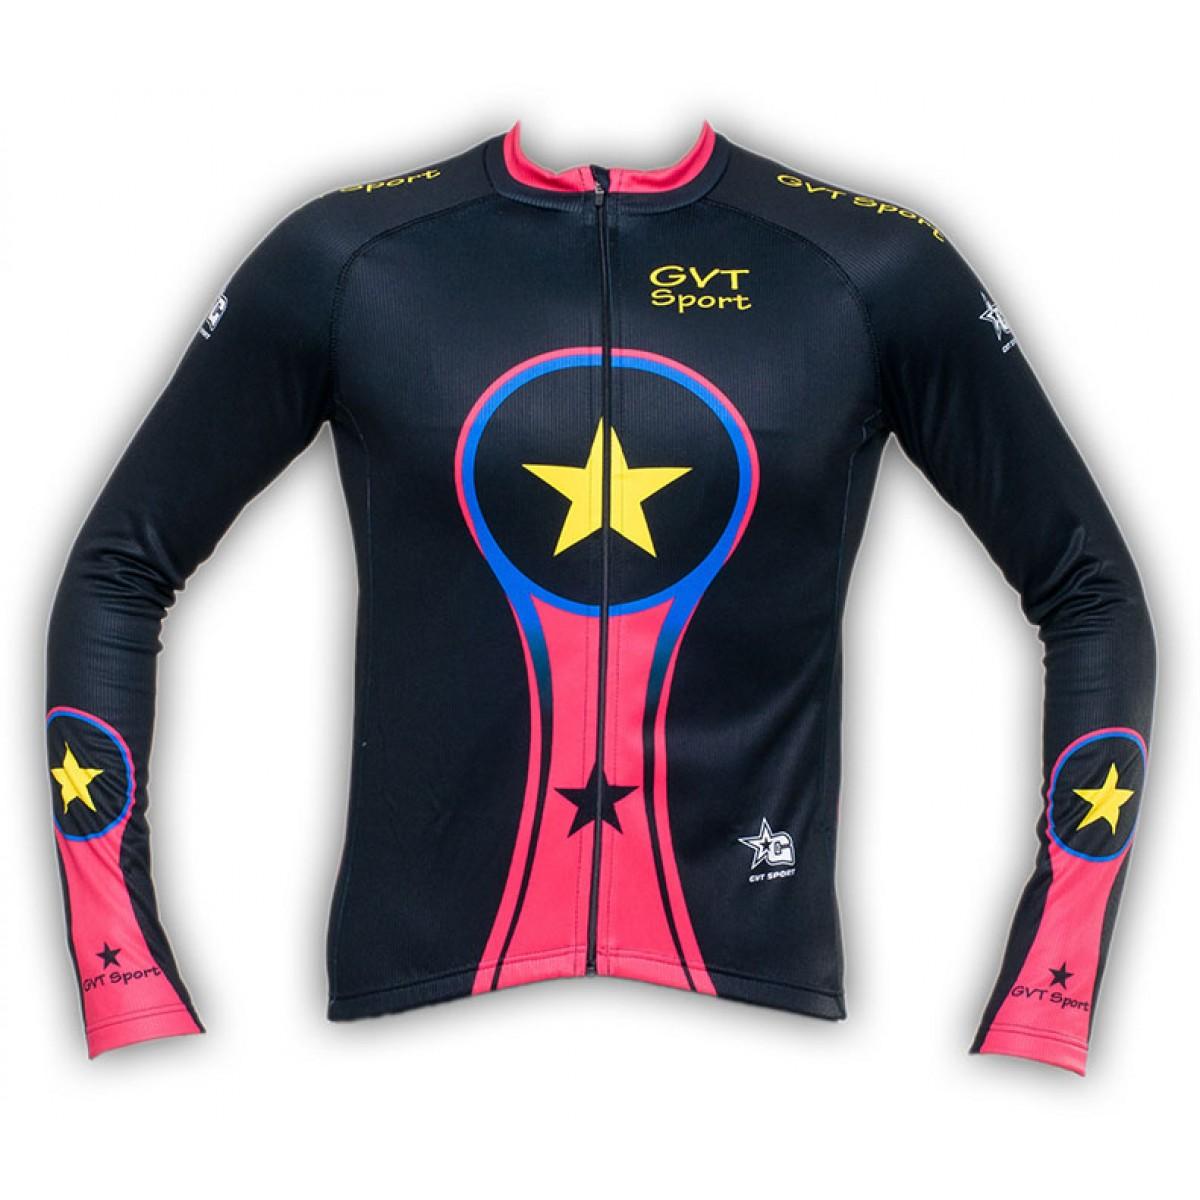 maillot cyclisme manche longue gvt bike colors. Black Bedroom Furniture Sets. Home Design Ideas